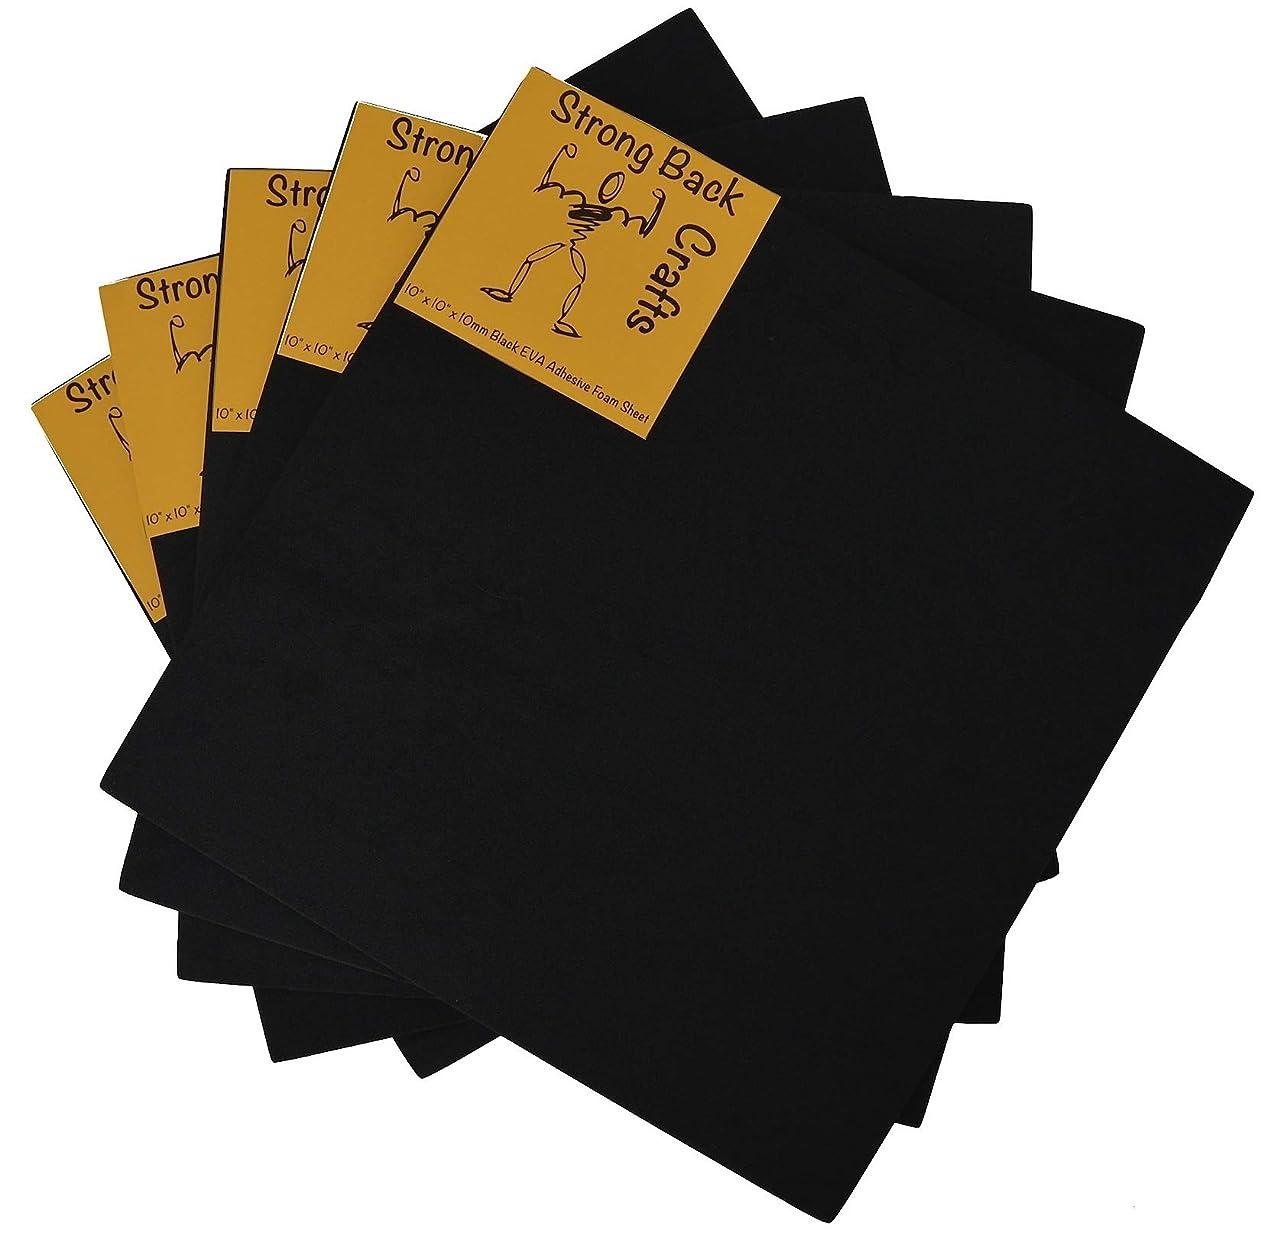 5 PACK 10mm EVA Self adhesive foam sheets --10mm (5 Pack)--10in x 10in (10